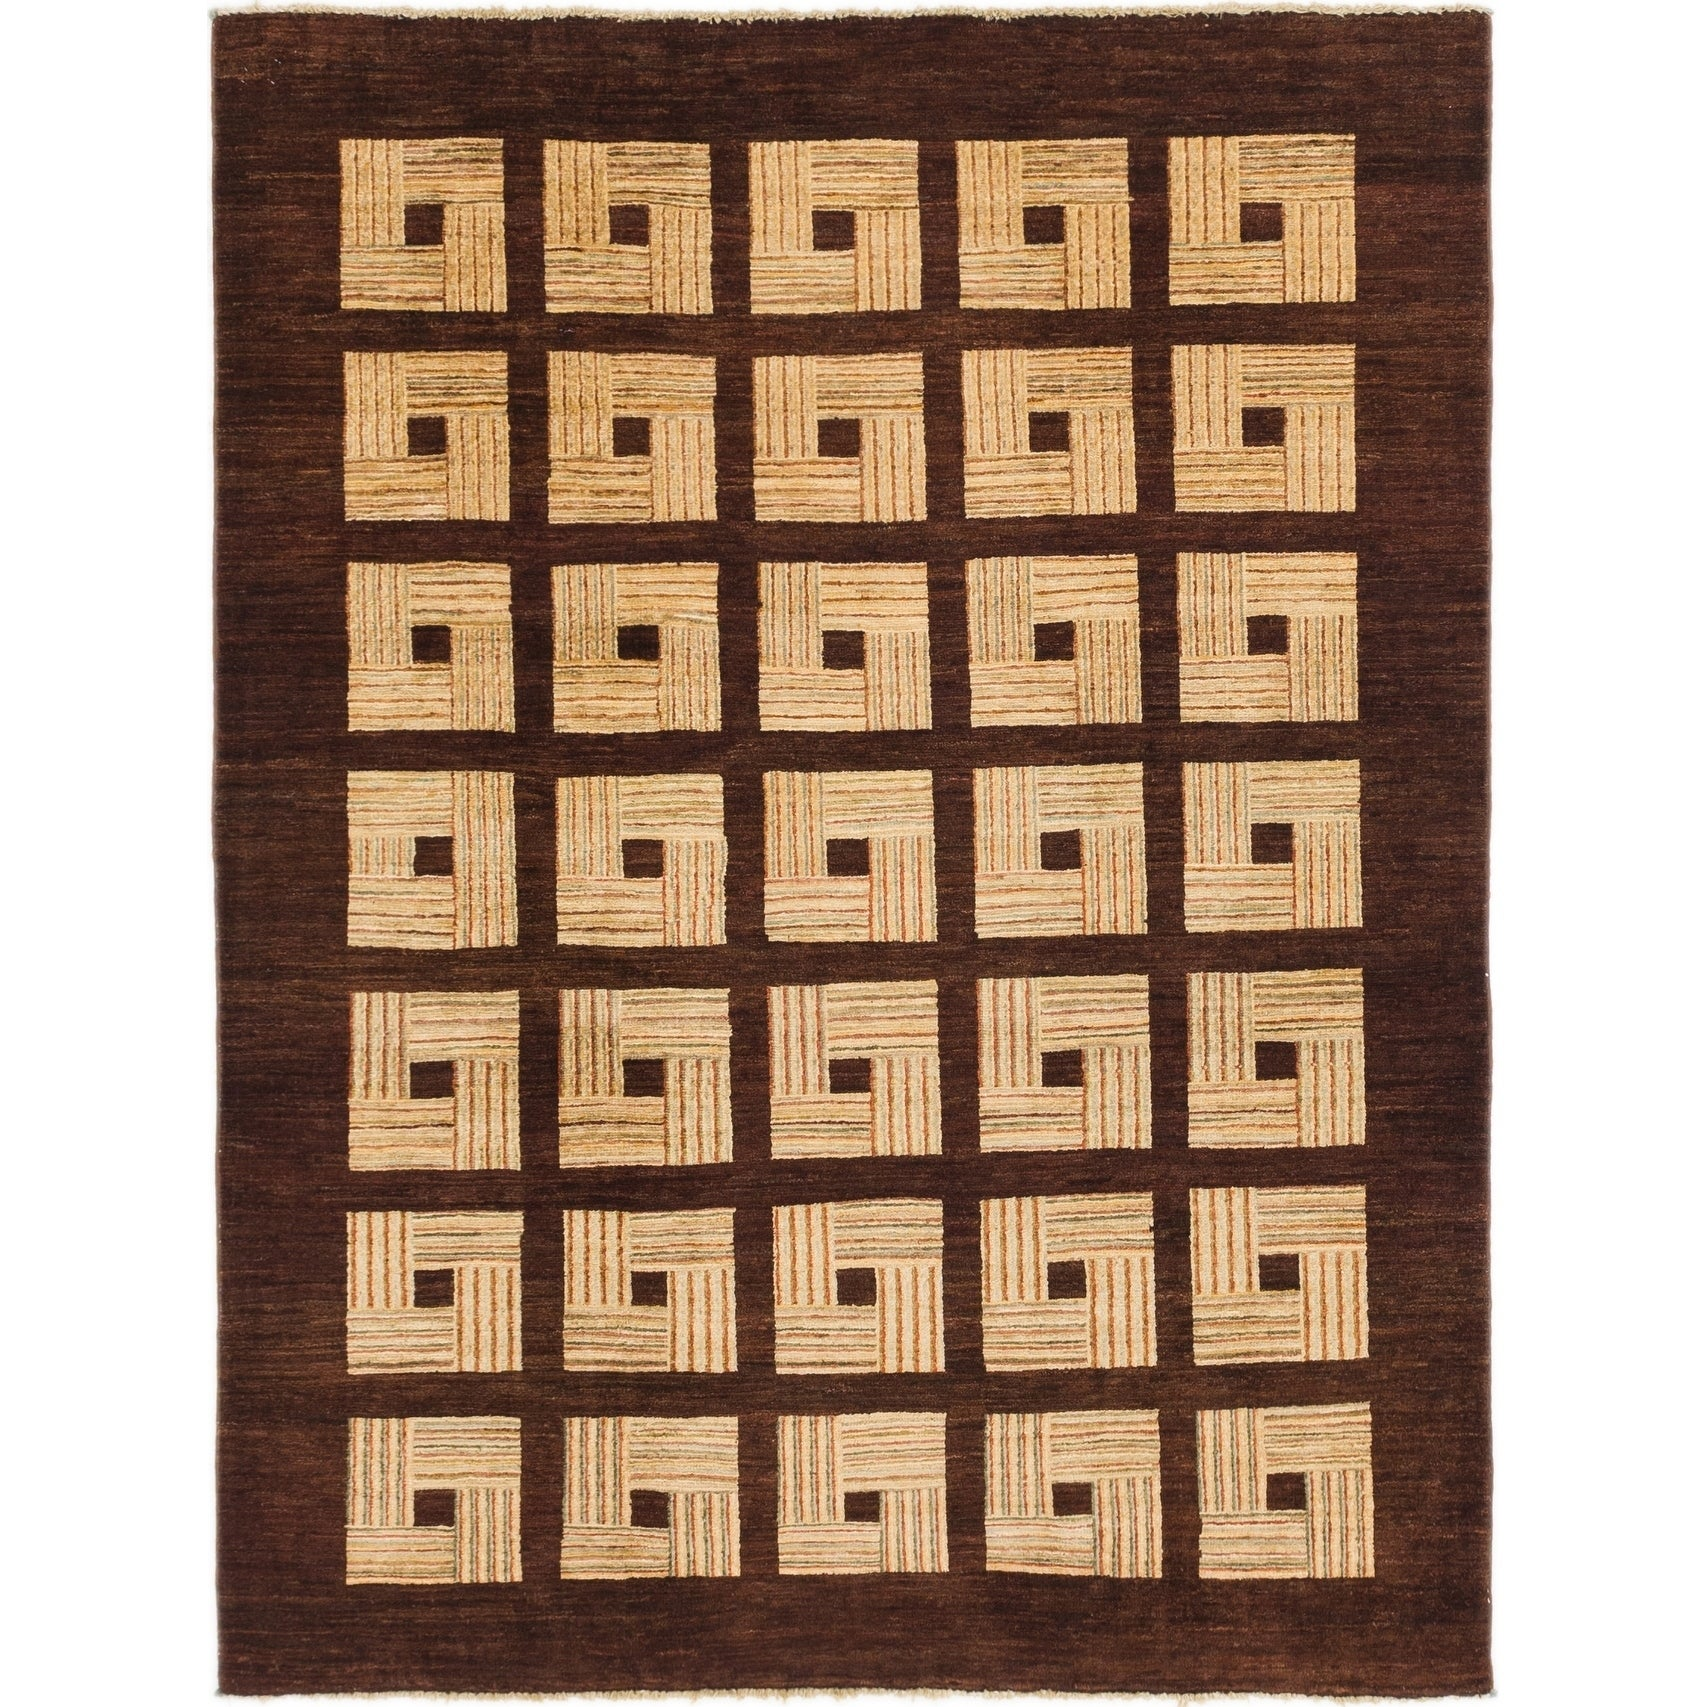 Hand Knotted Kashkuli Gabbeh Wool Area Rug - 5 x 6 8 (Burgundy - 5 x 6 8)